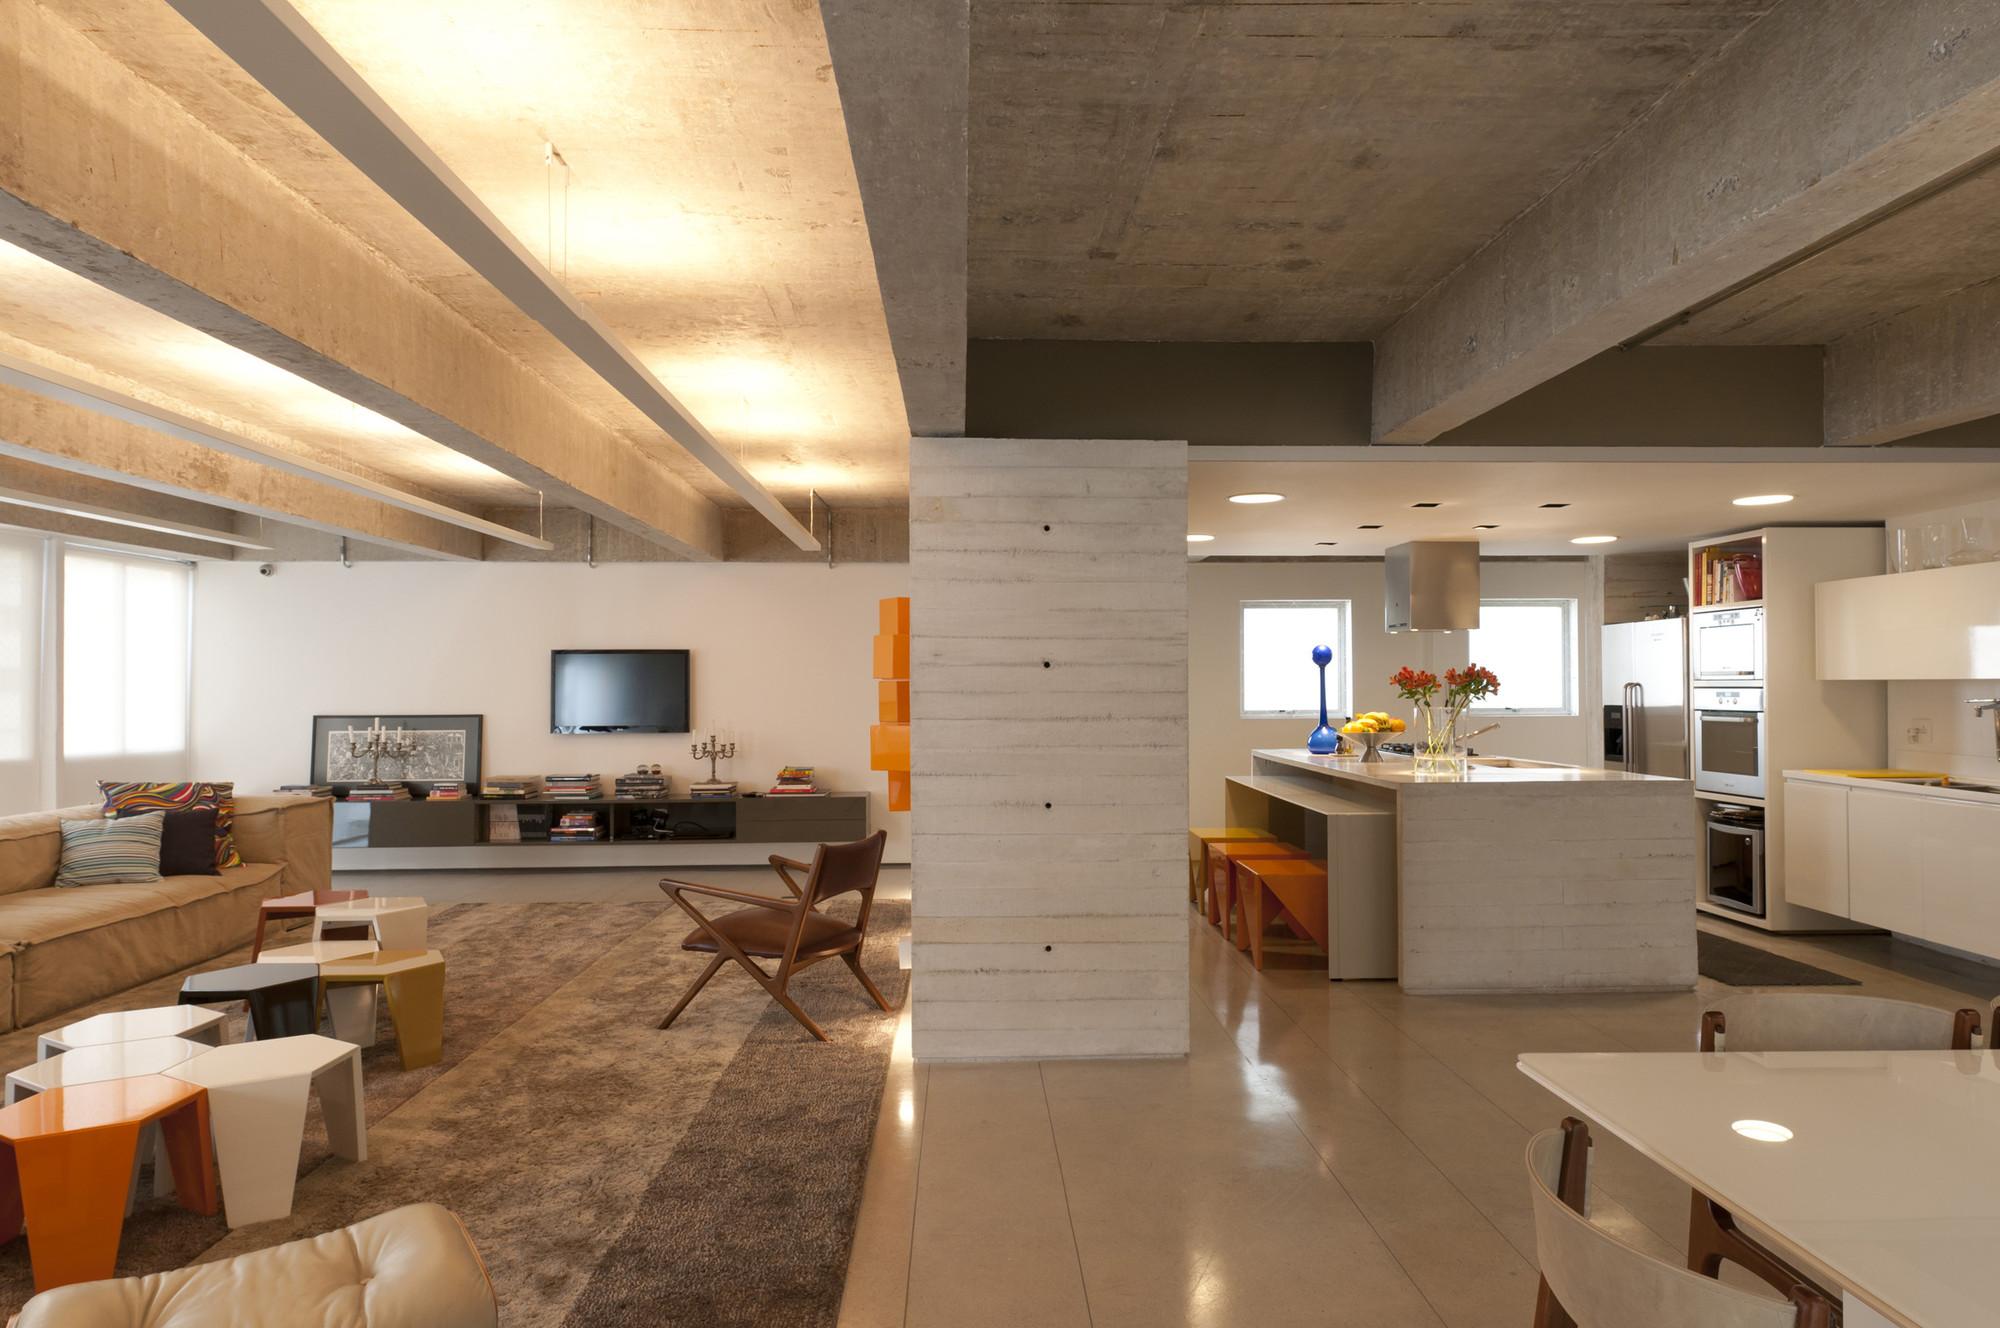 Barão de Pirapitingui Apartment / Felipe Rodrigues Arquiteto, © Raul Fonseca